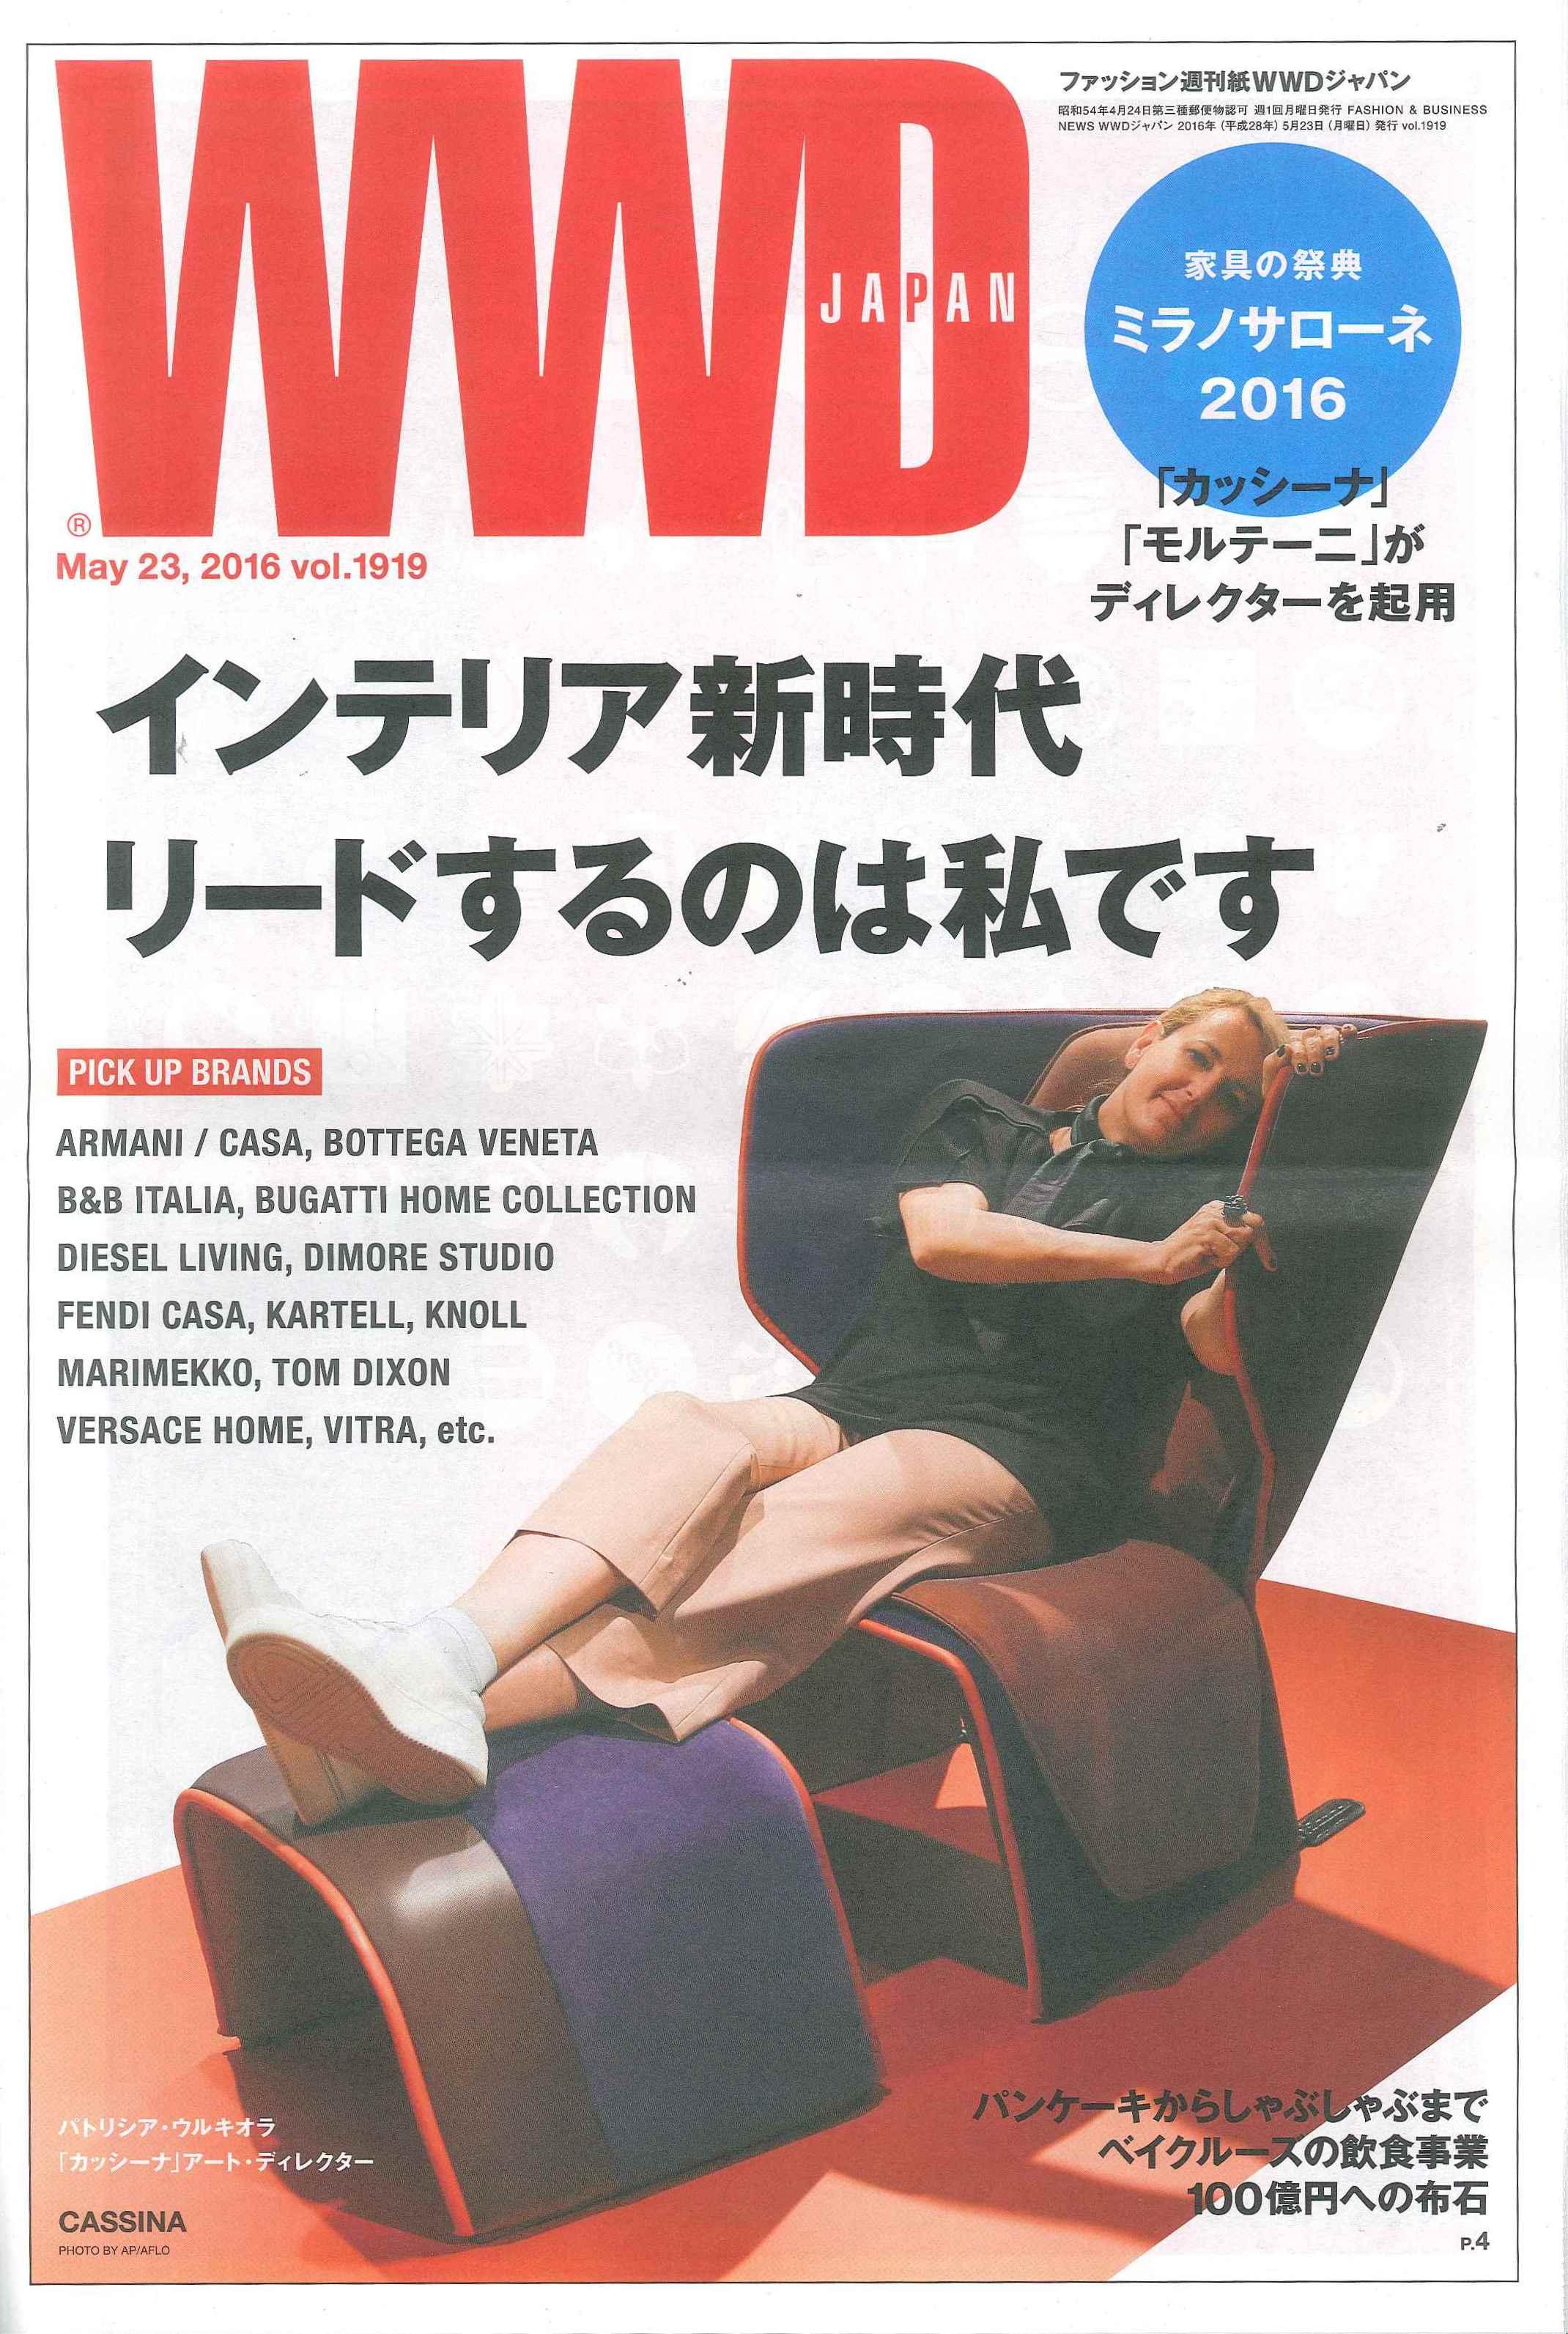 WWD May 23号 baxter掲載